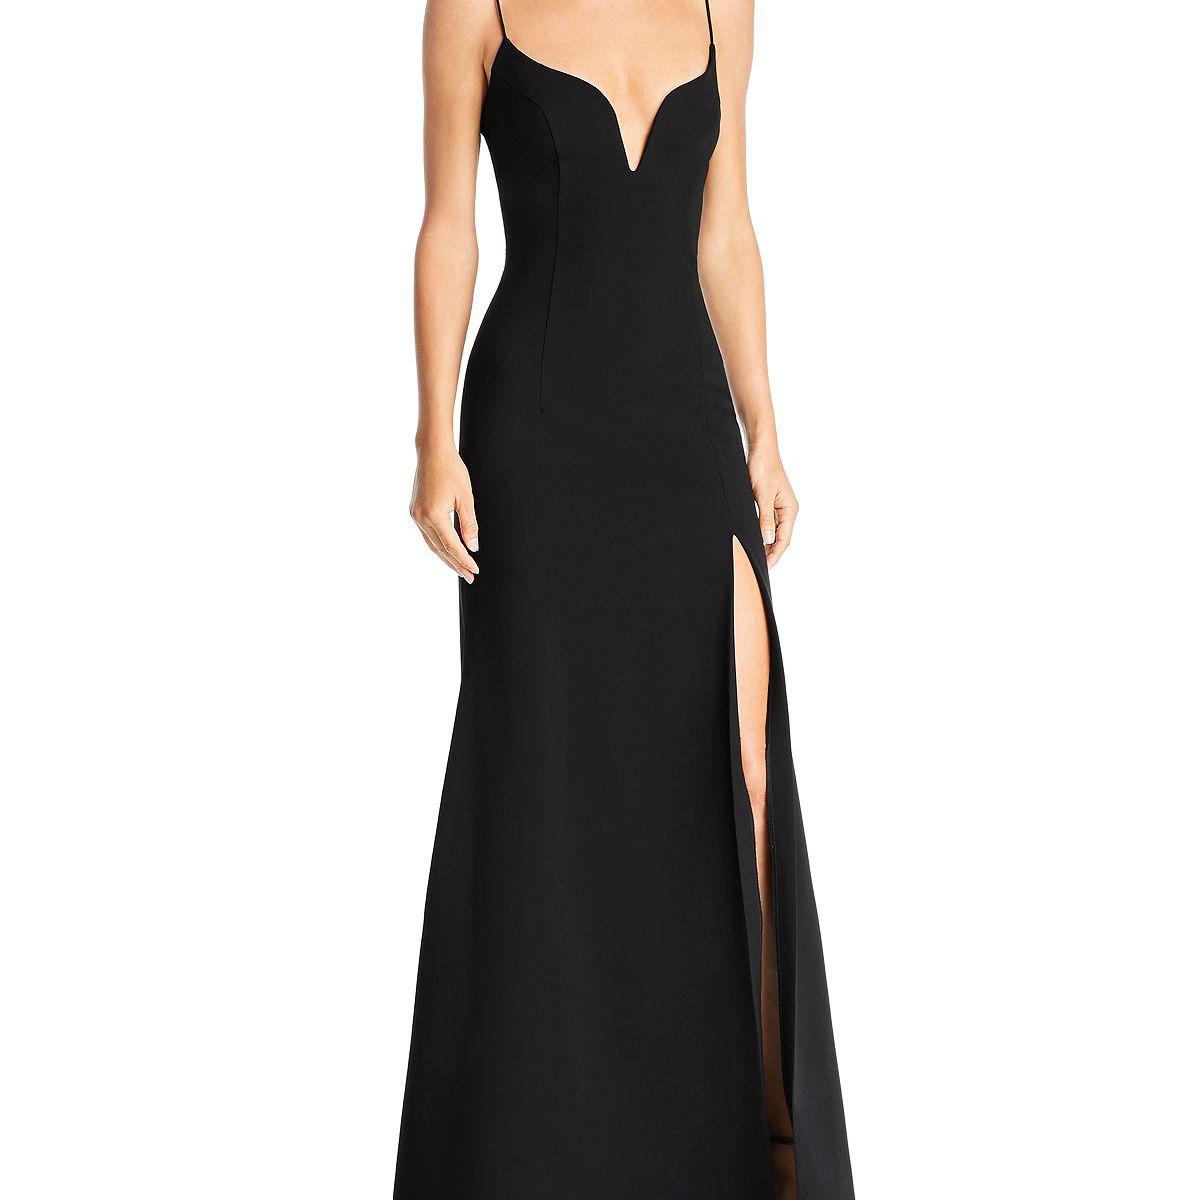 Black Tie Wedding Gowns: 50 Wedding Guest Dresses For A Black-Tie Wedding